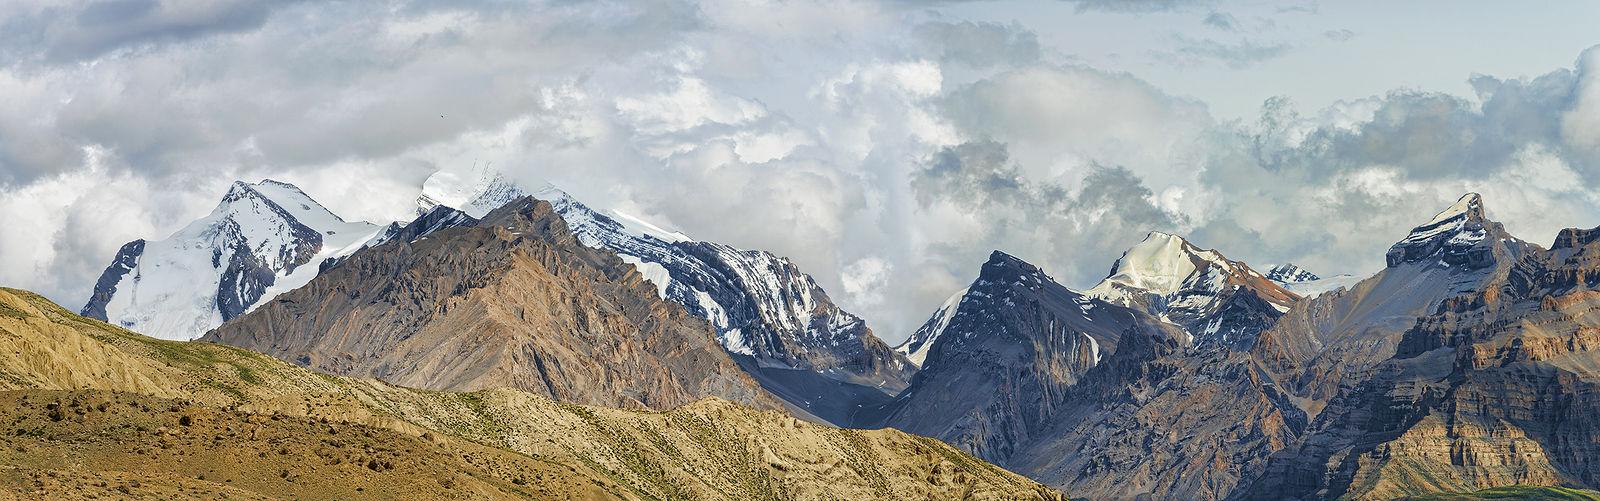 Ivan Aleshin. NH21 and other Himalayan Roads. 0011